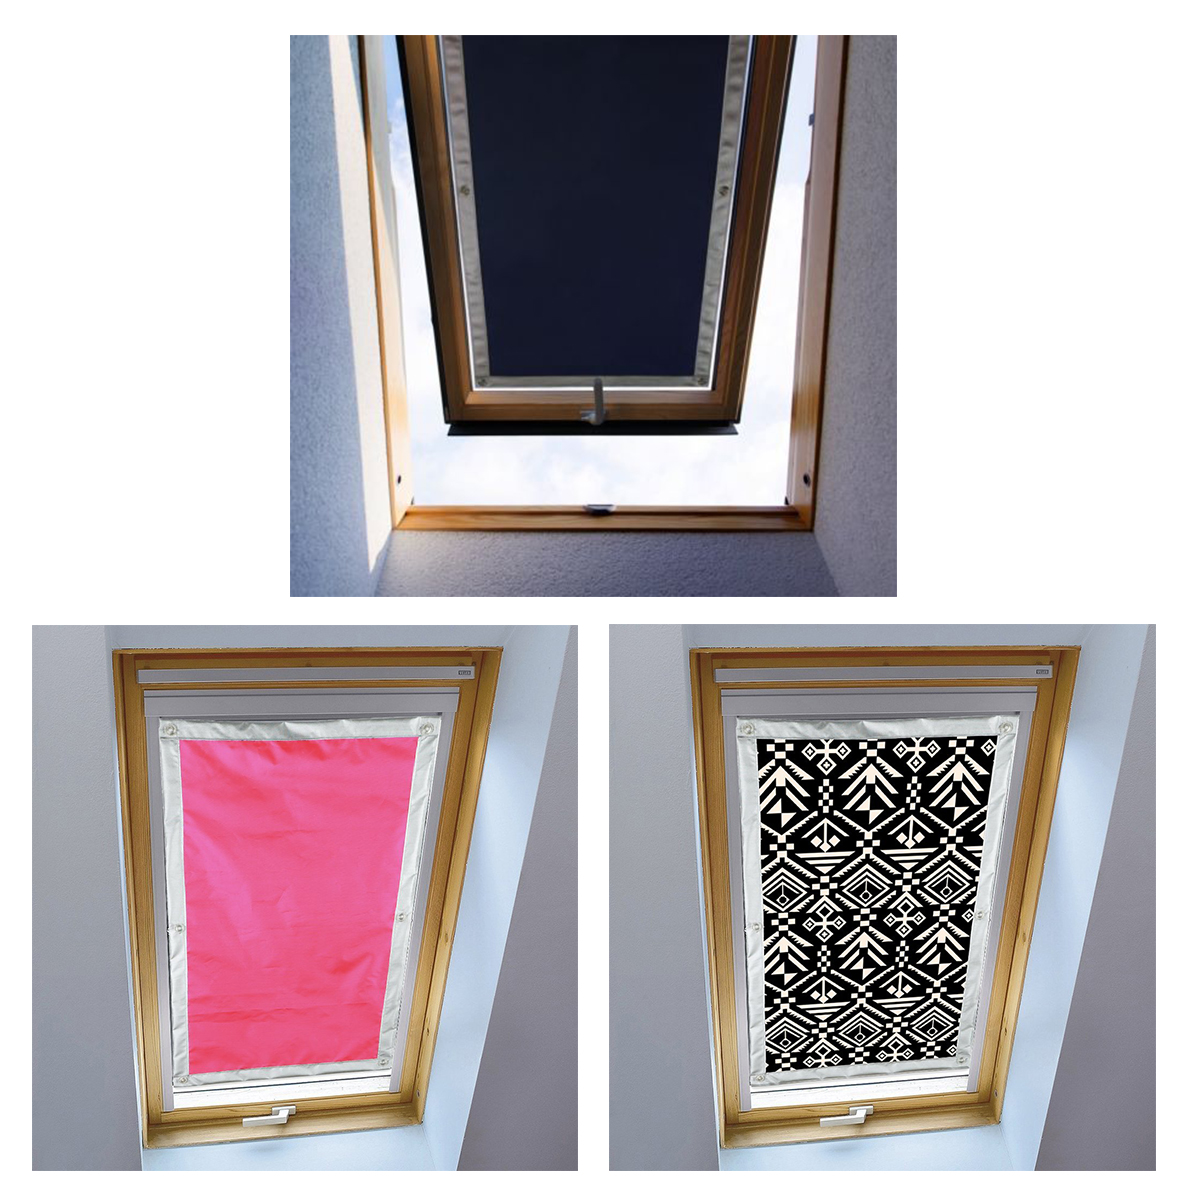 fensterrollo verdunkelungsrollo sonnenschutz dachfenster saugn pfe 97 anti uv ebay. Black Bedroom Furniture Sets. Home Design Ideas